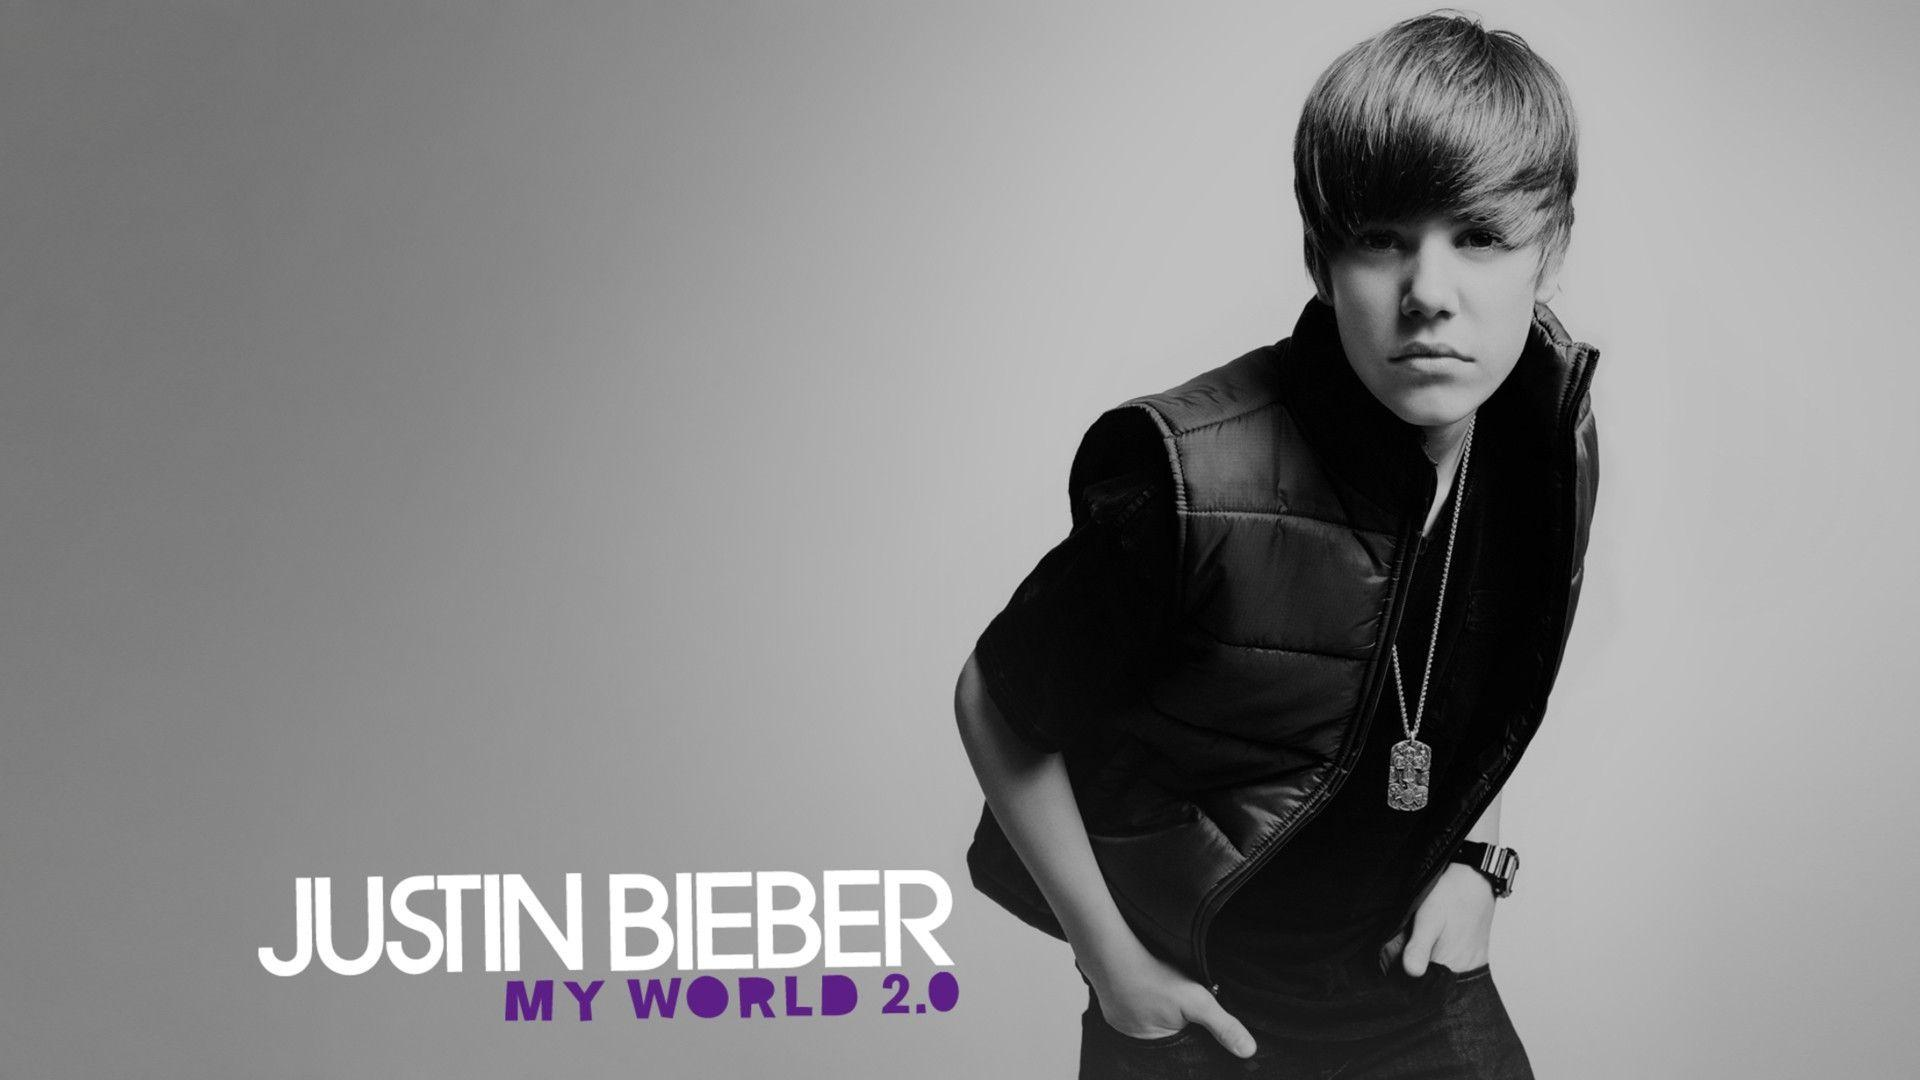 Justin Bieber Tumblr Backgrounds 2018 67 Images: Justin Bieber 2018 Wallpapers